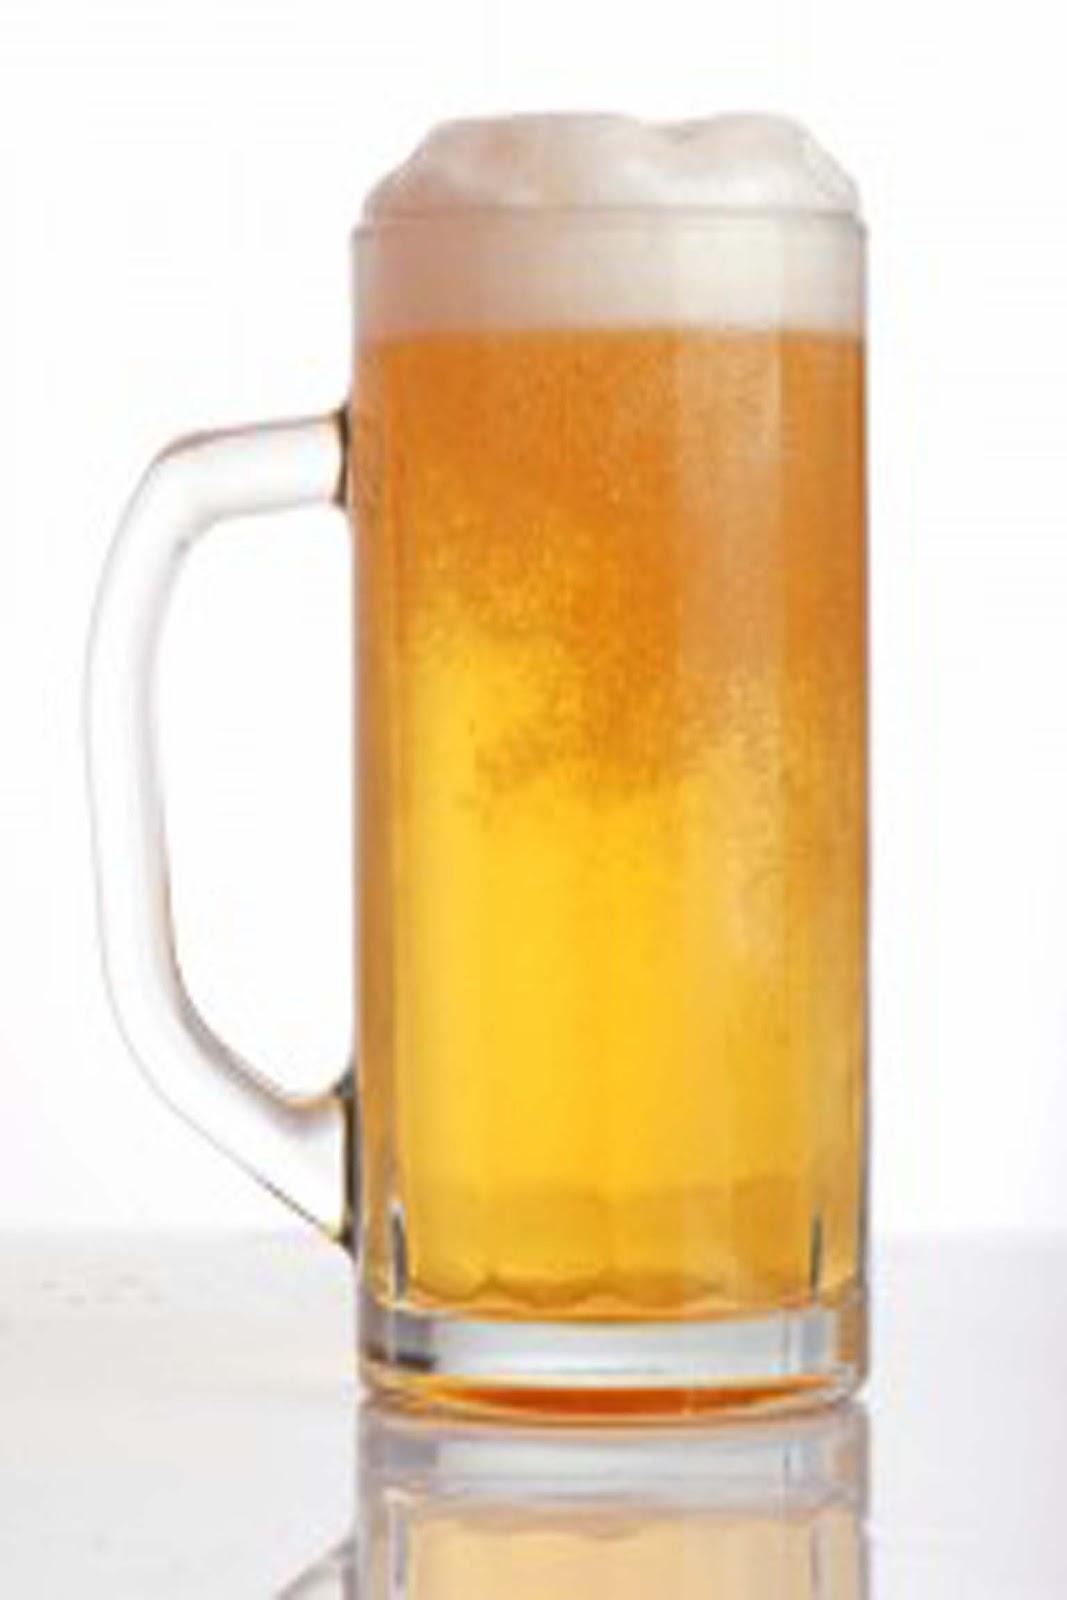 Fotos de vasos de cerveza 45